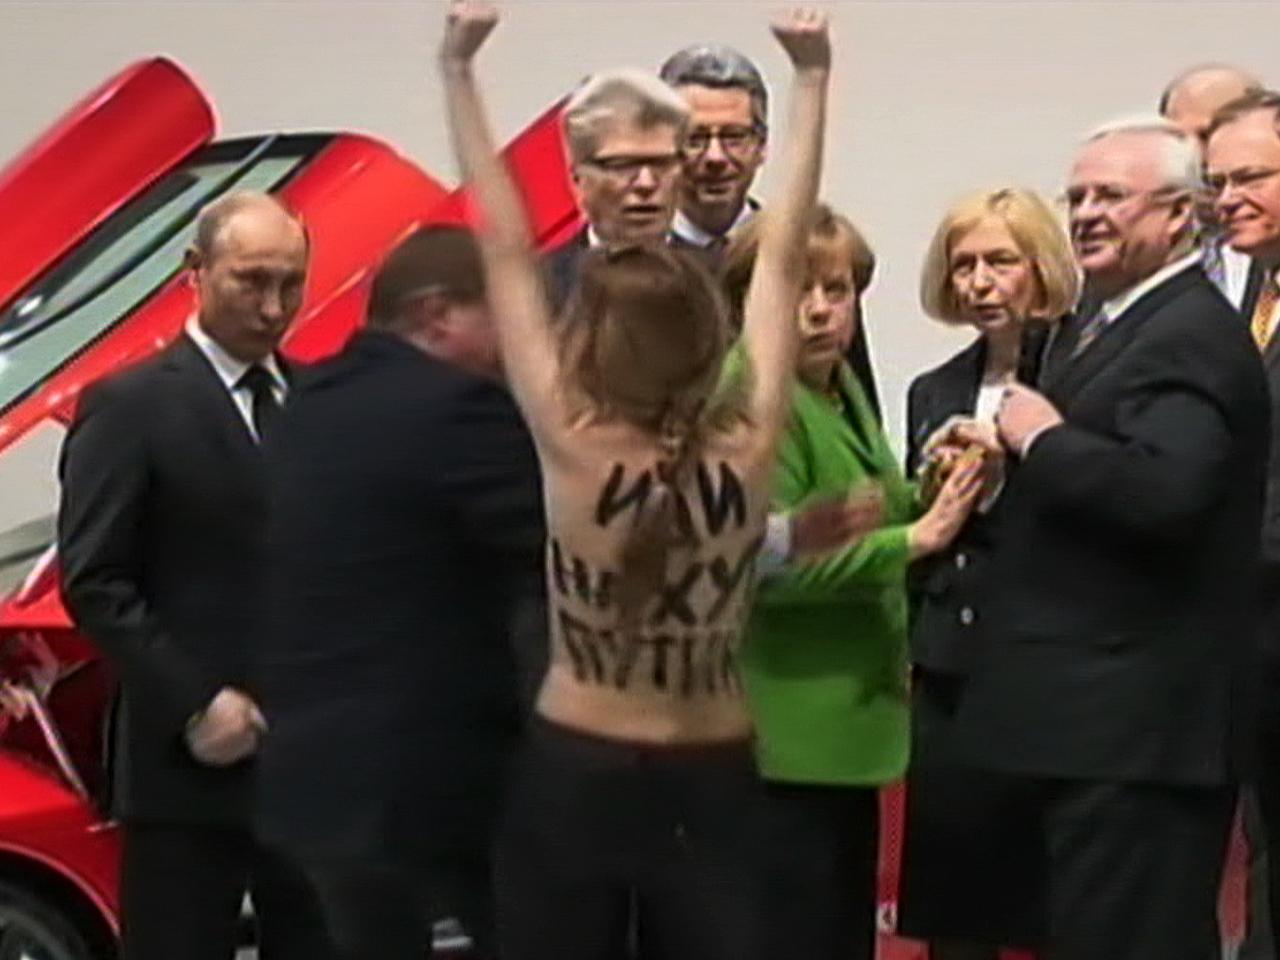 Angela Merkel Topless topless protesters bust up putin, merkel event